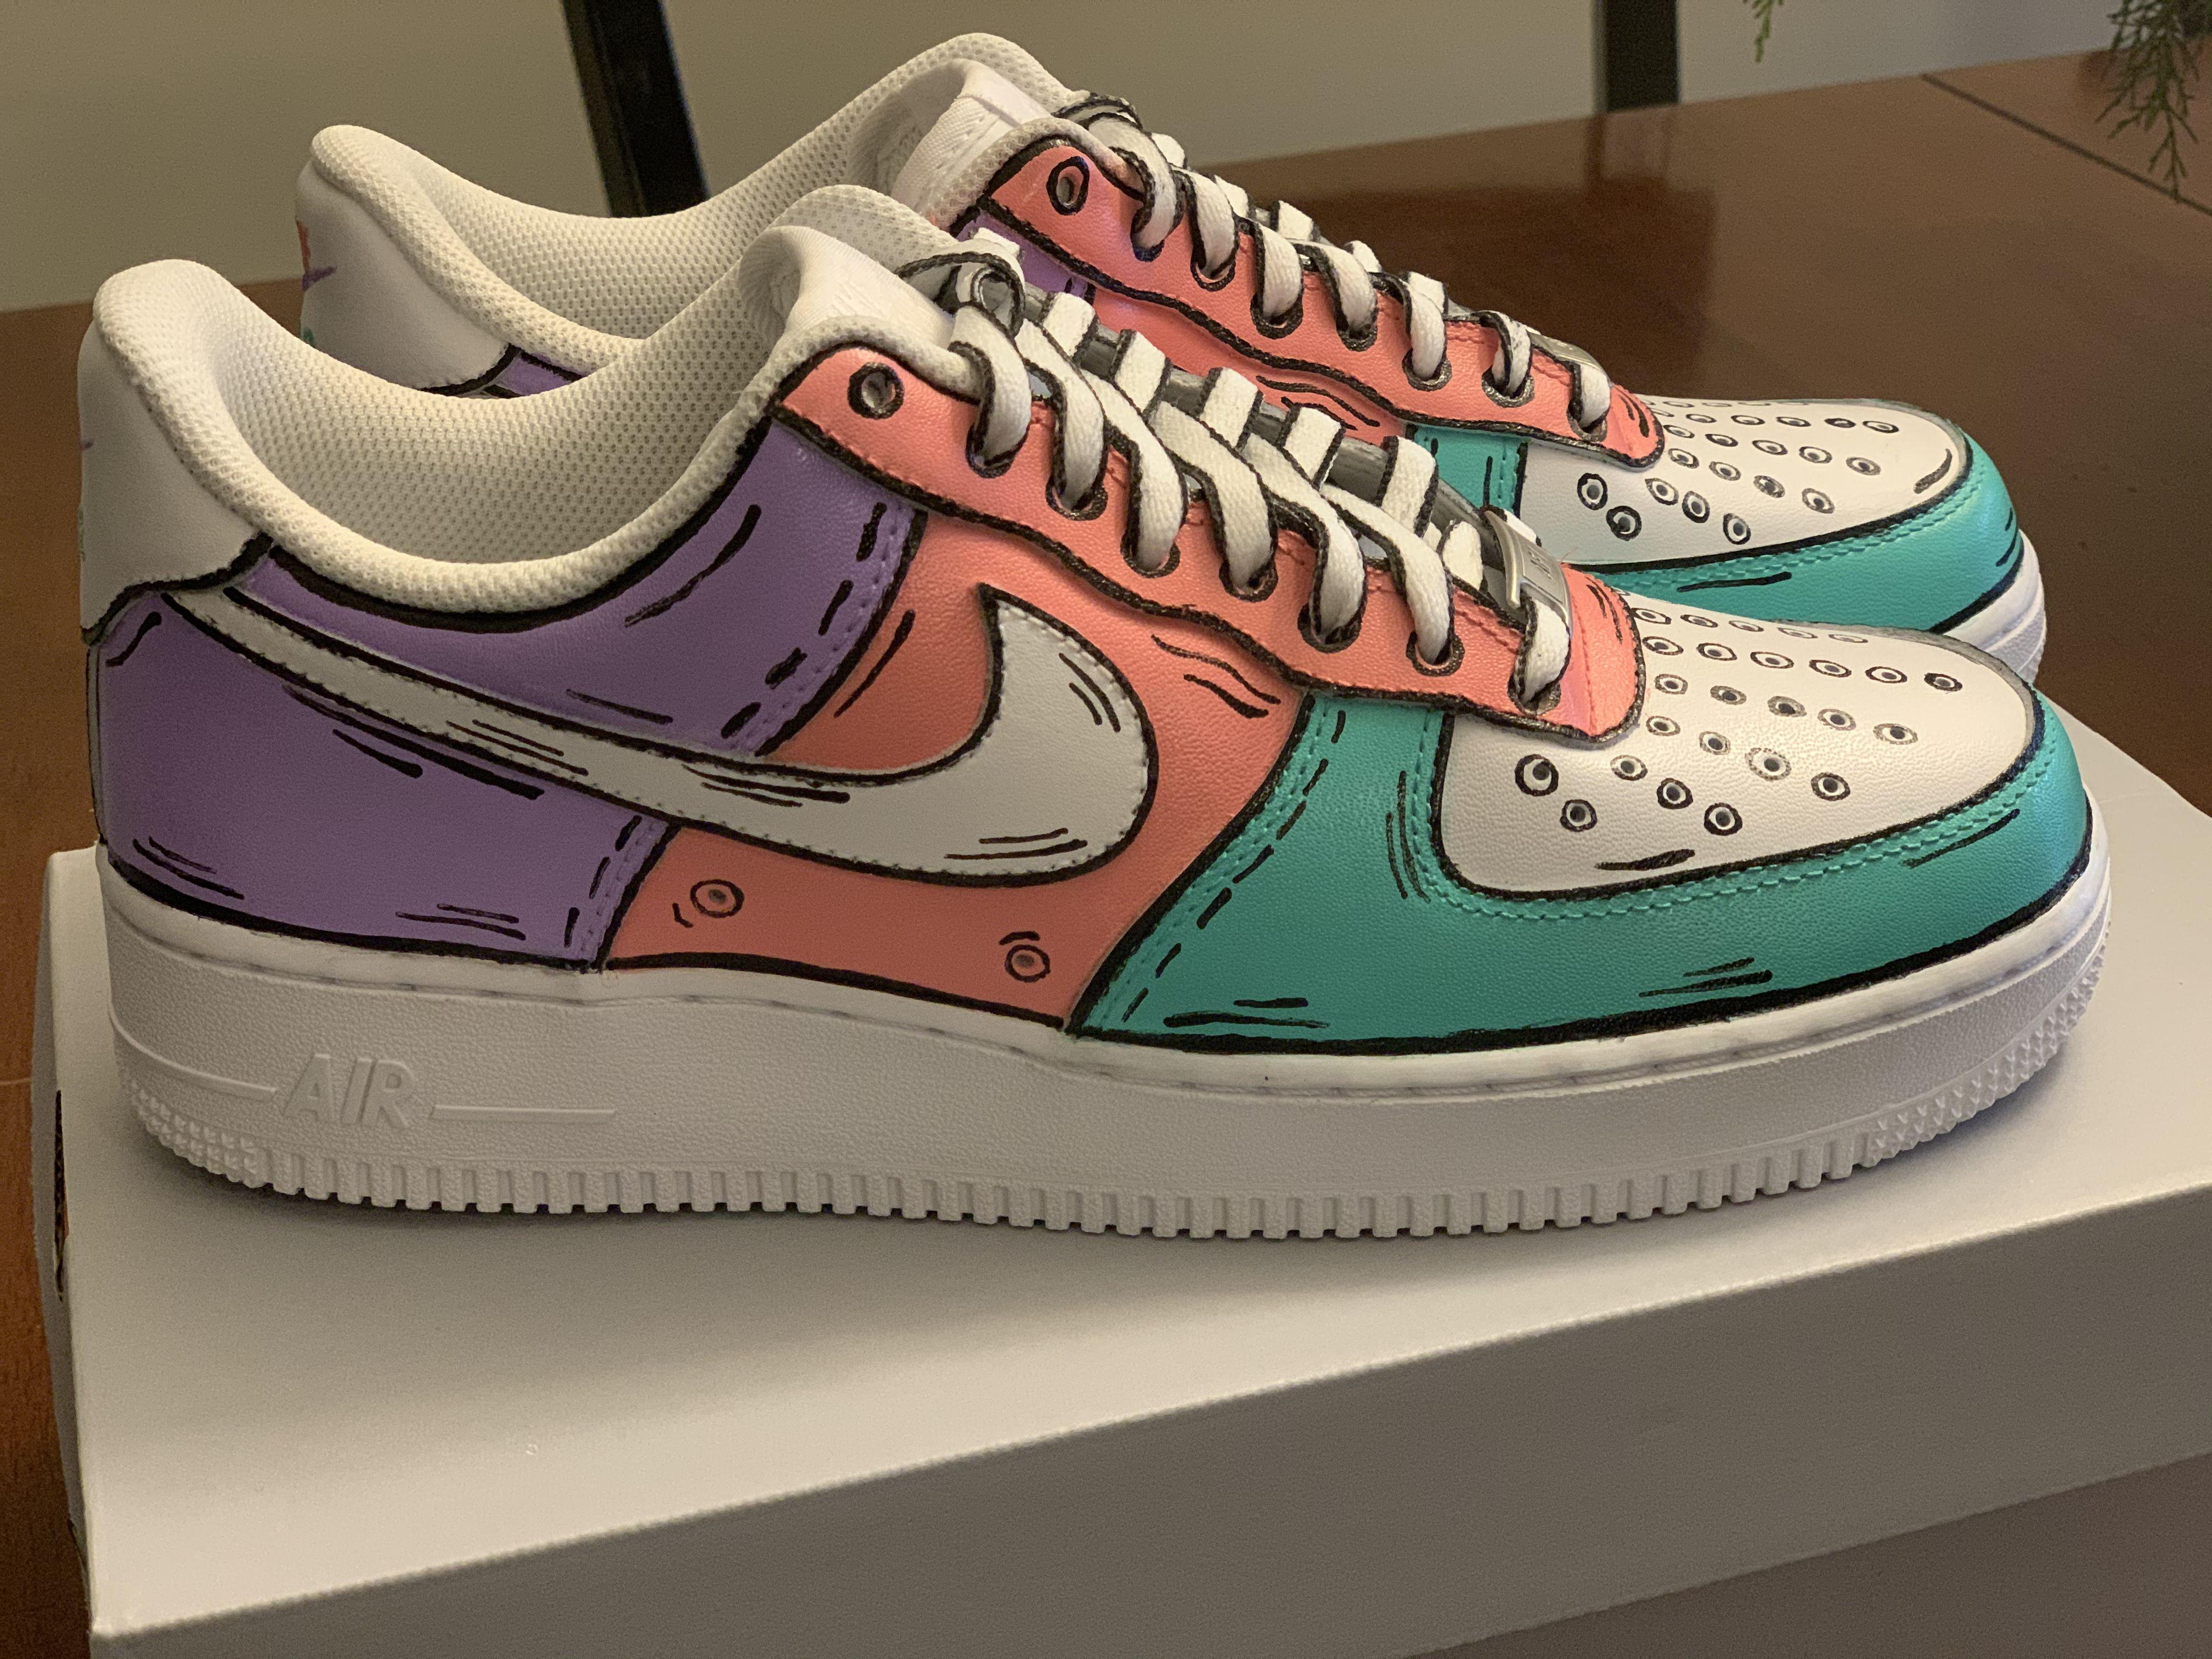 Pin von Magdalena Rudnik auf Nike air force in 2020 | Tumblr